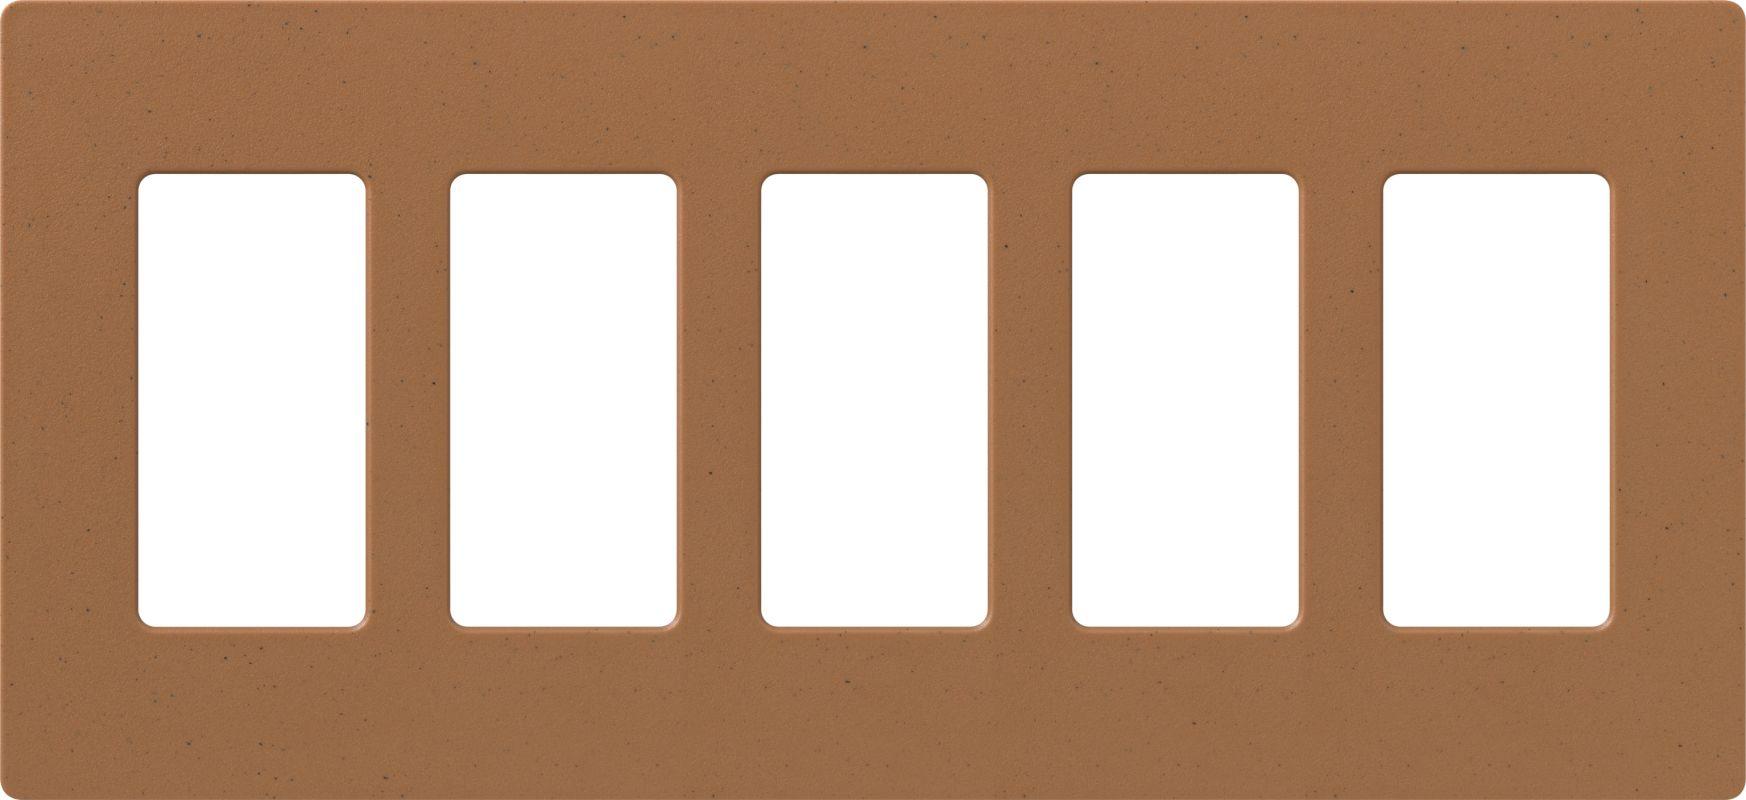 Lutron CW-5 Claro Five Gang Designer Wall Plate Terracotta Wall Sale $42.84 ITEM: bci1856027 ID#:SC-5-TC UPC: 27557475969 :